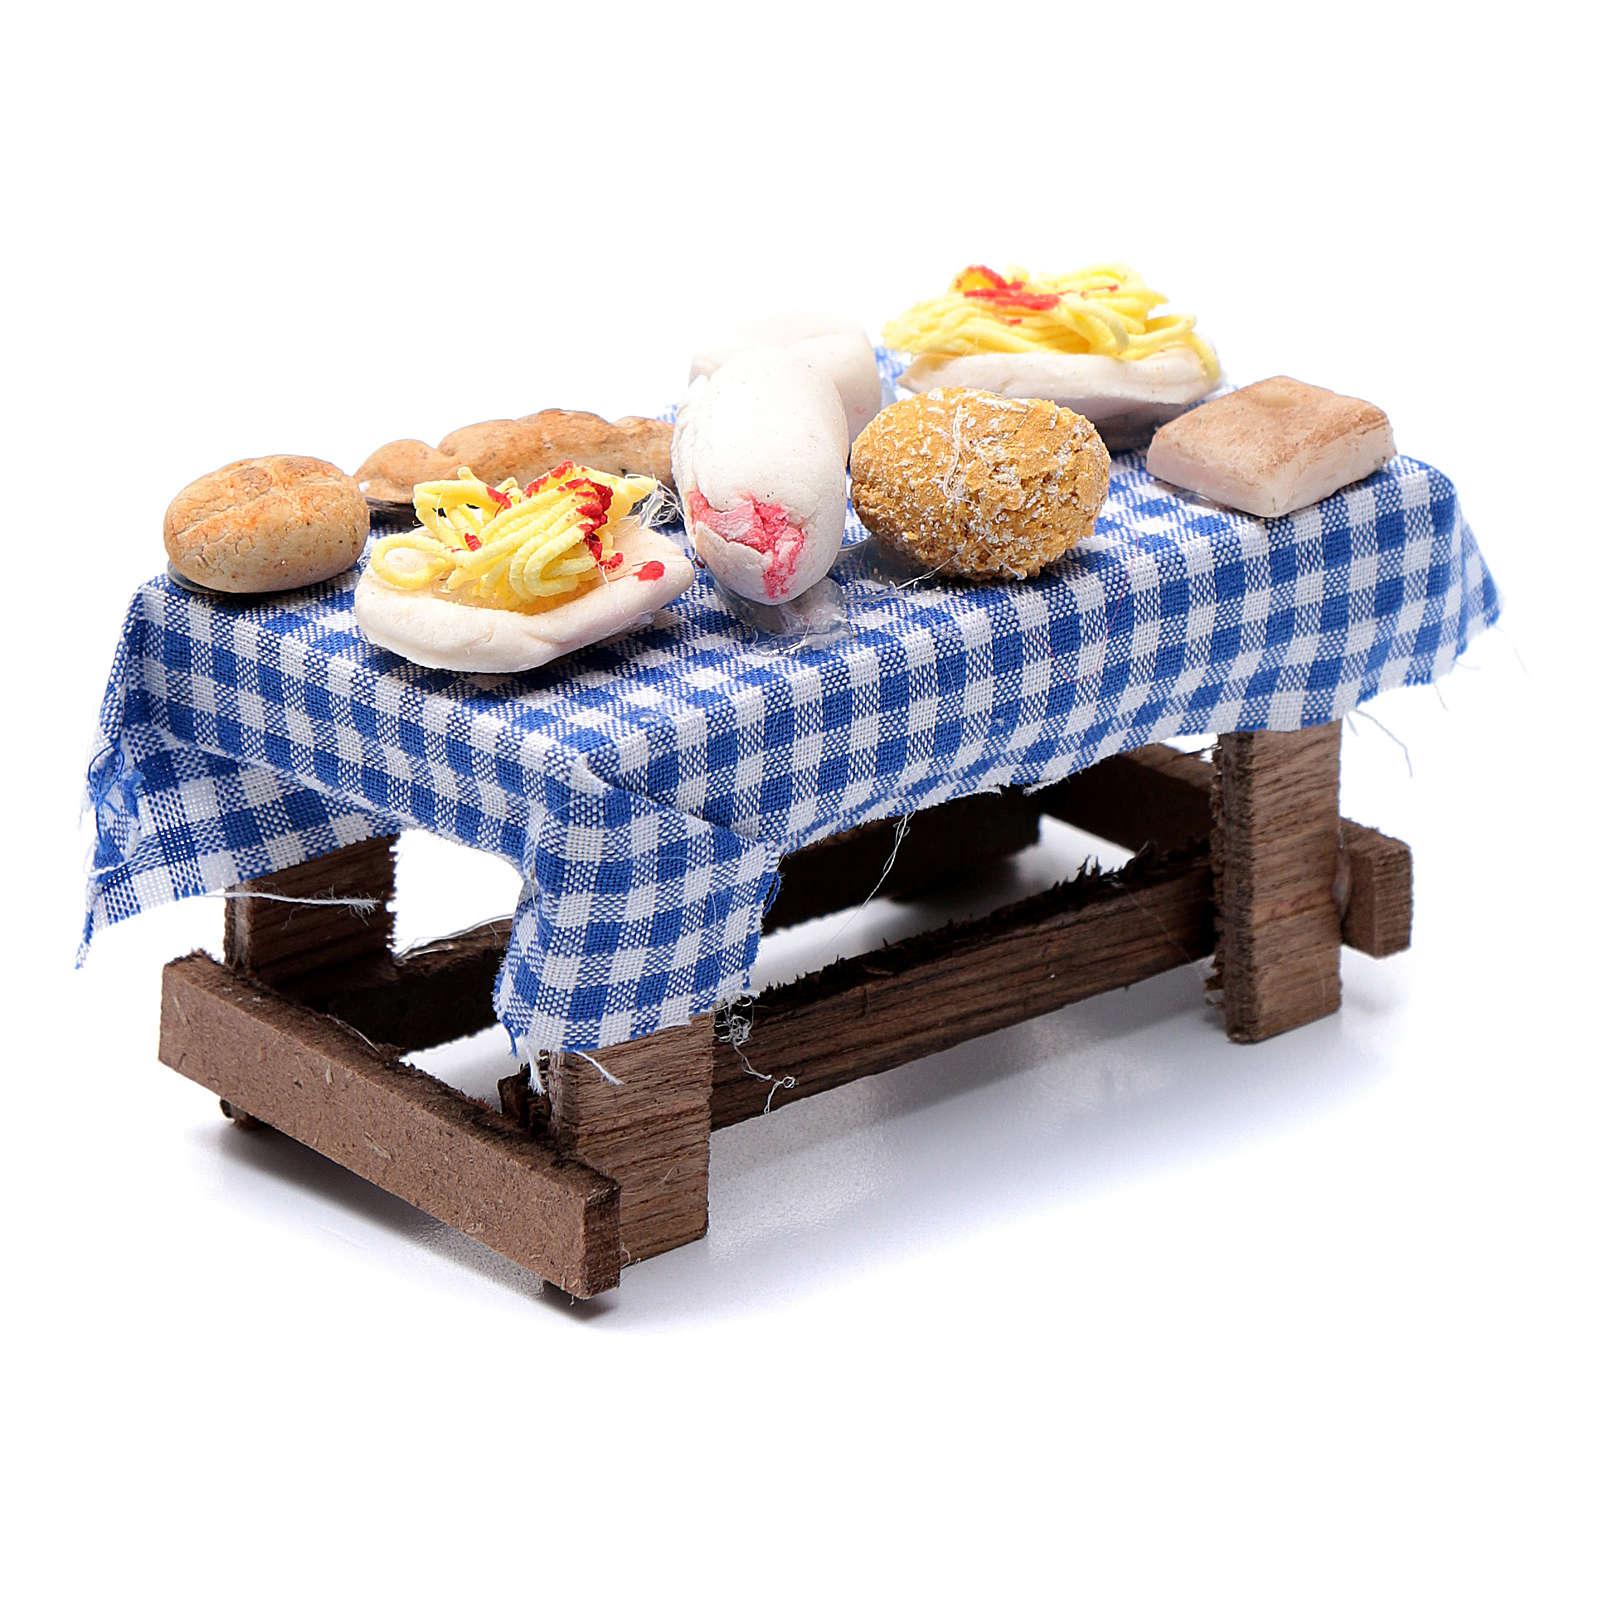 Neapolitan nativity scene table with food 5x10x5 cm 4